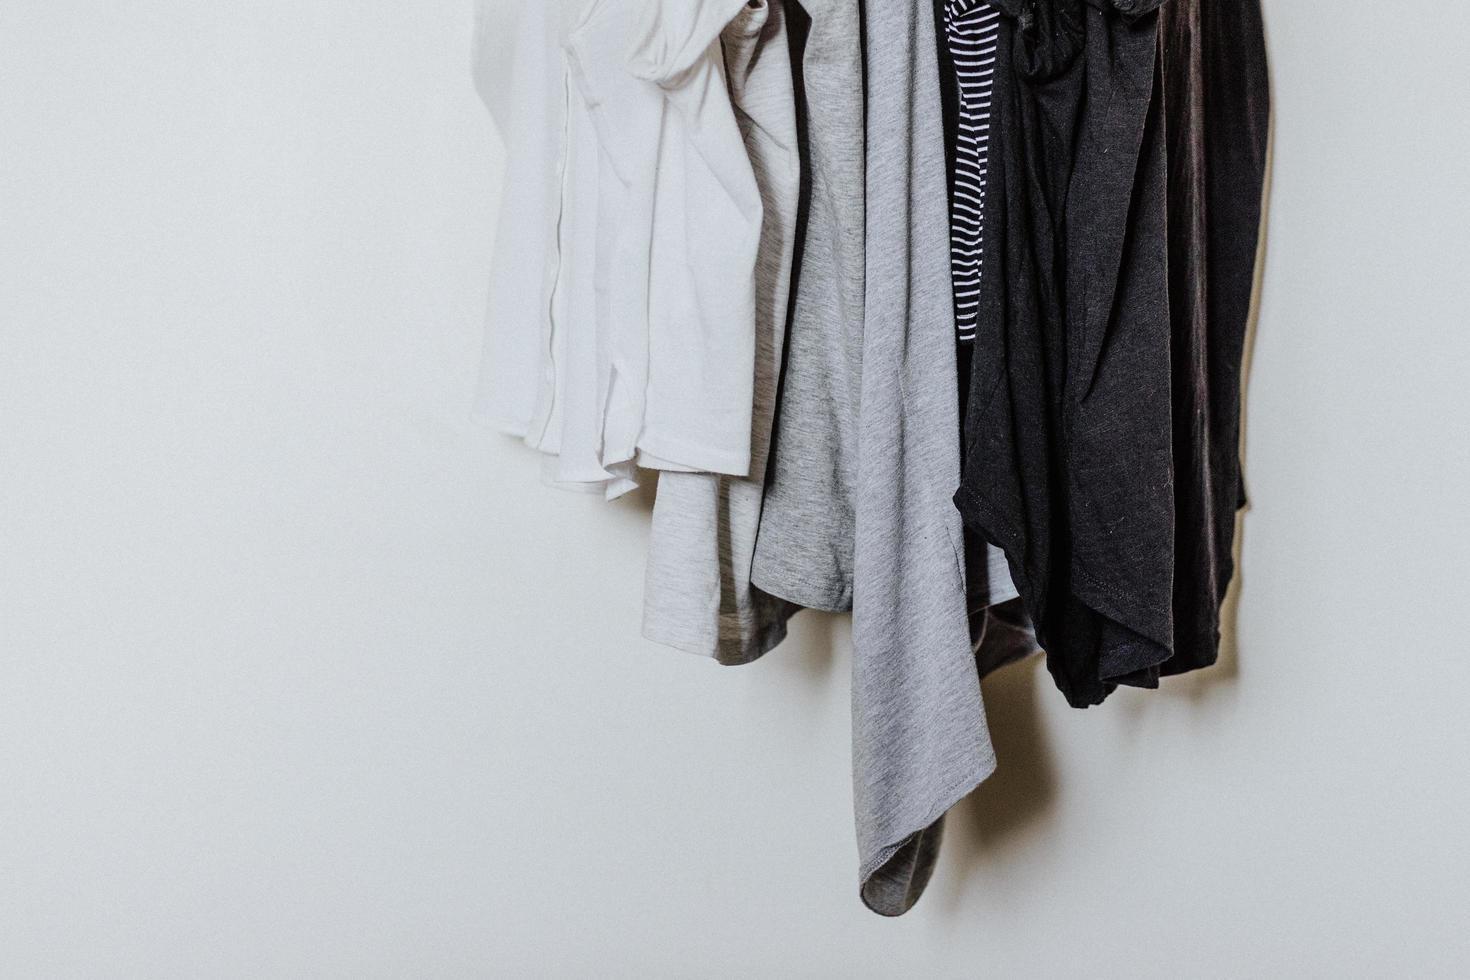 Hanged T-shirts against white background photo